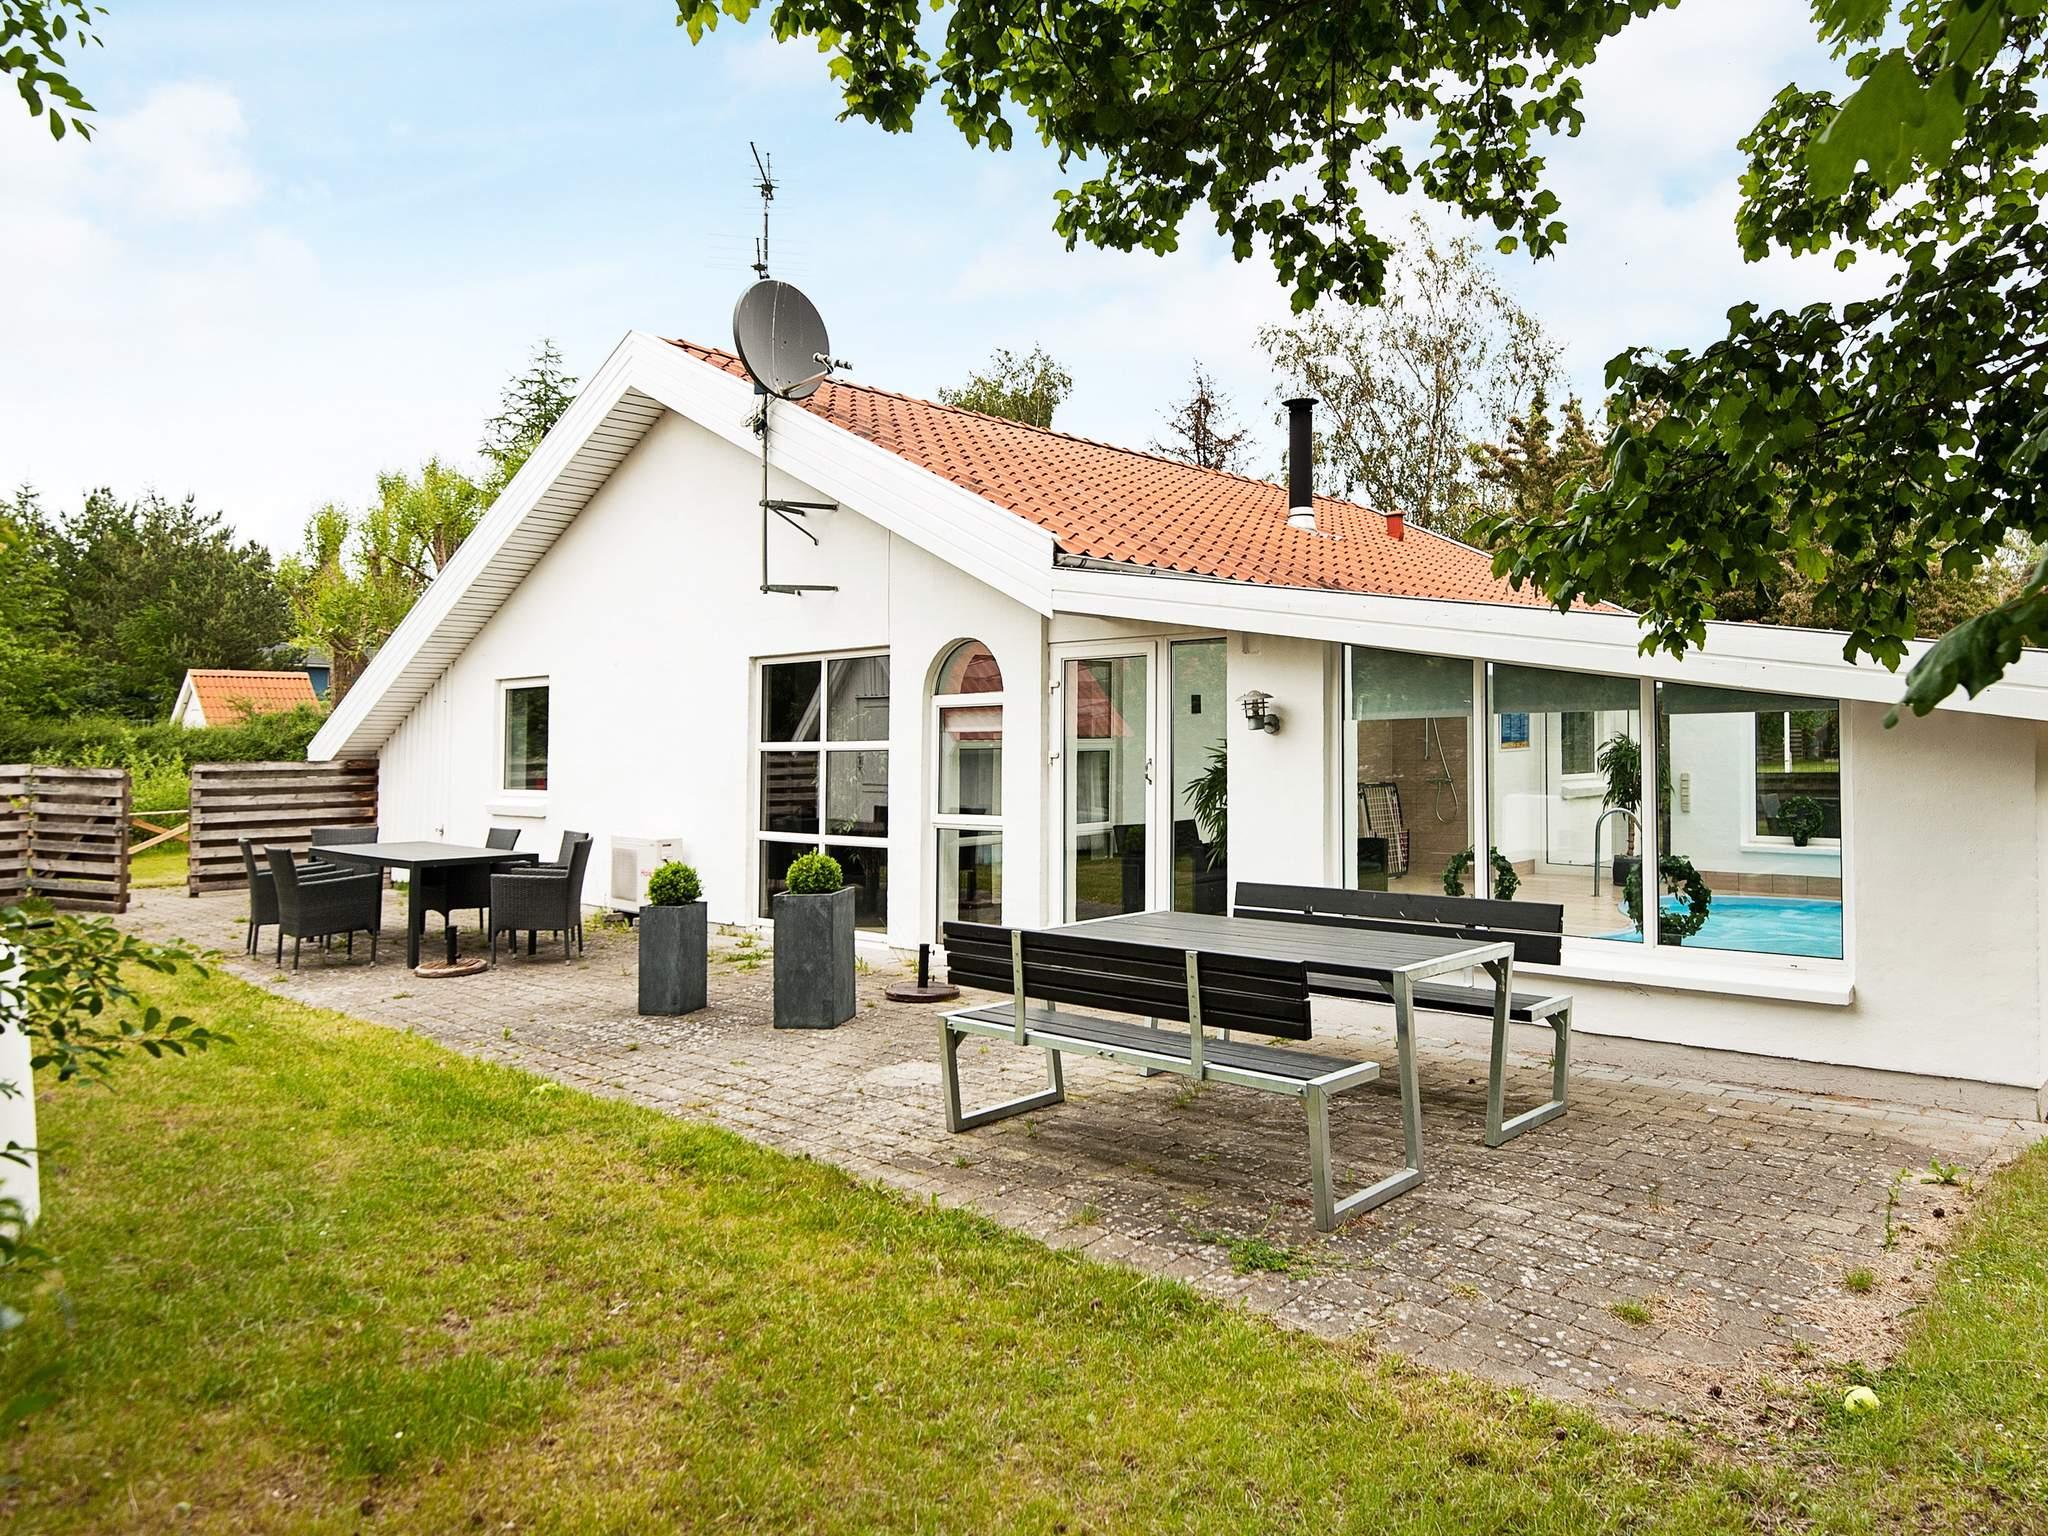 Ferienhaus Egsmark Strand (493427), Egsmark, , Ostjütland, Dänemark, Bild 1